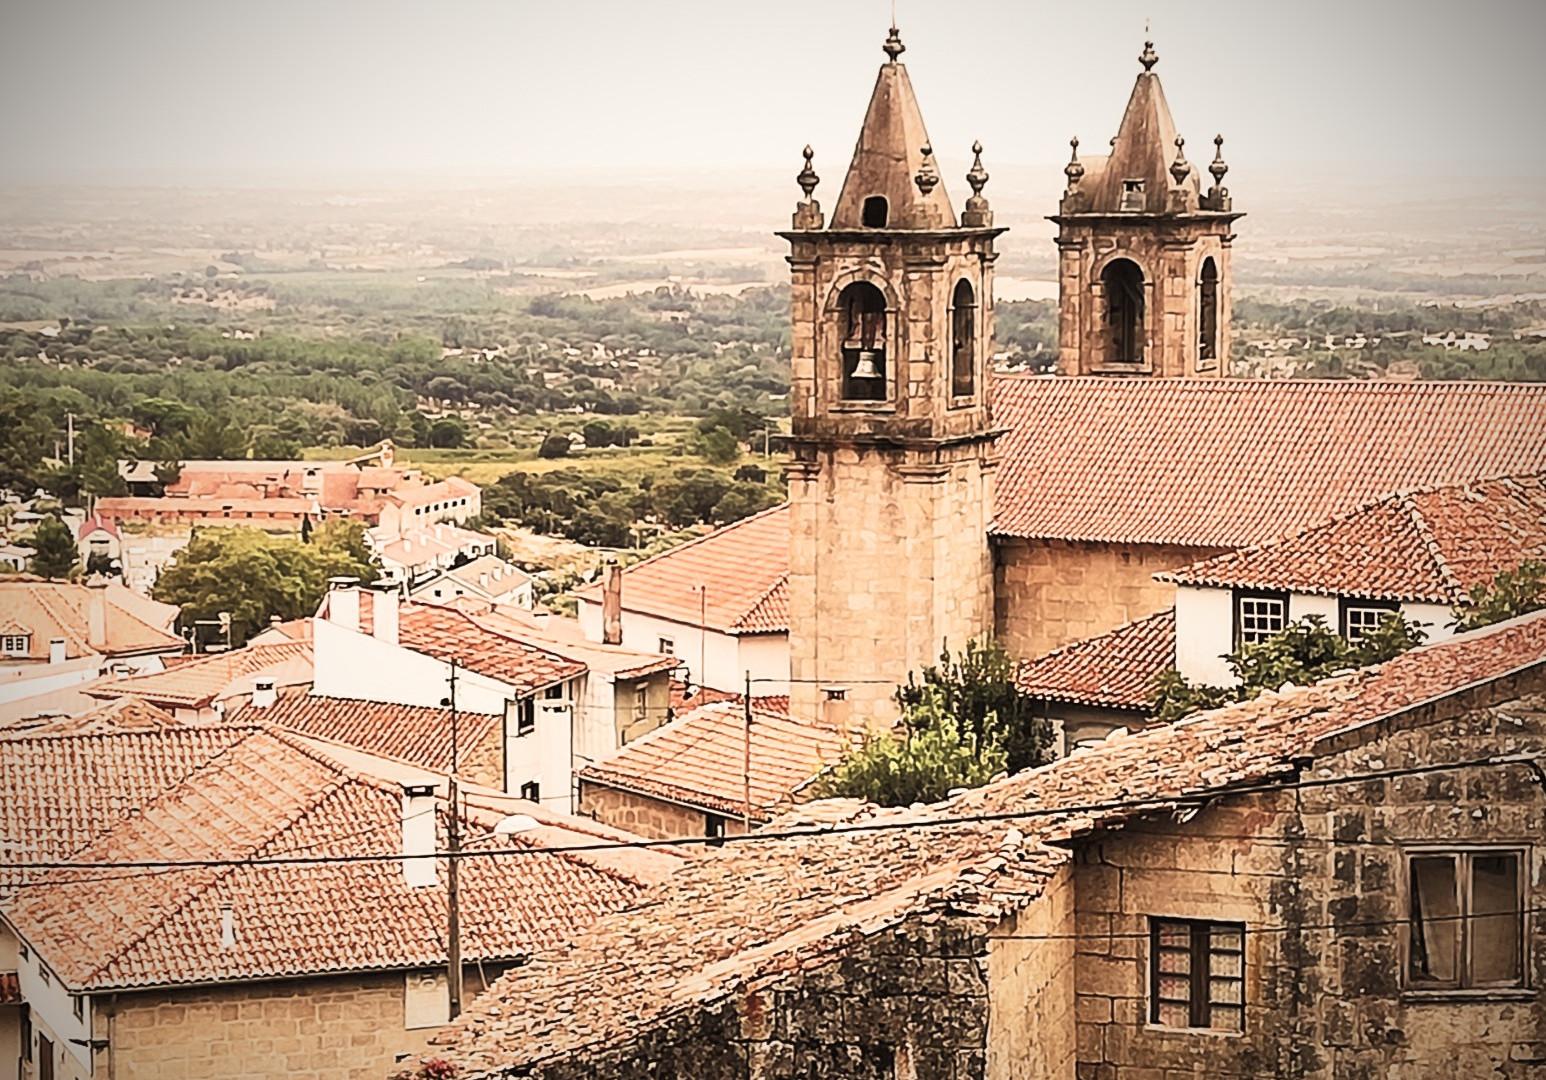 Casas da Vila de Alpedrinha Aldeia Rural Natureza Patrimonio